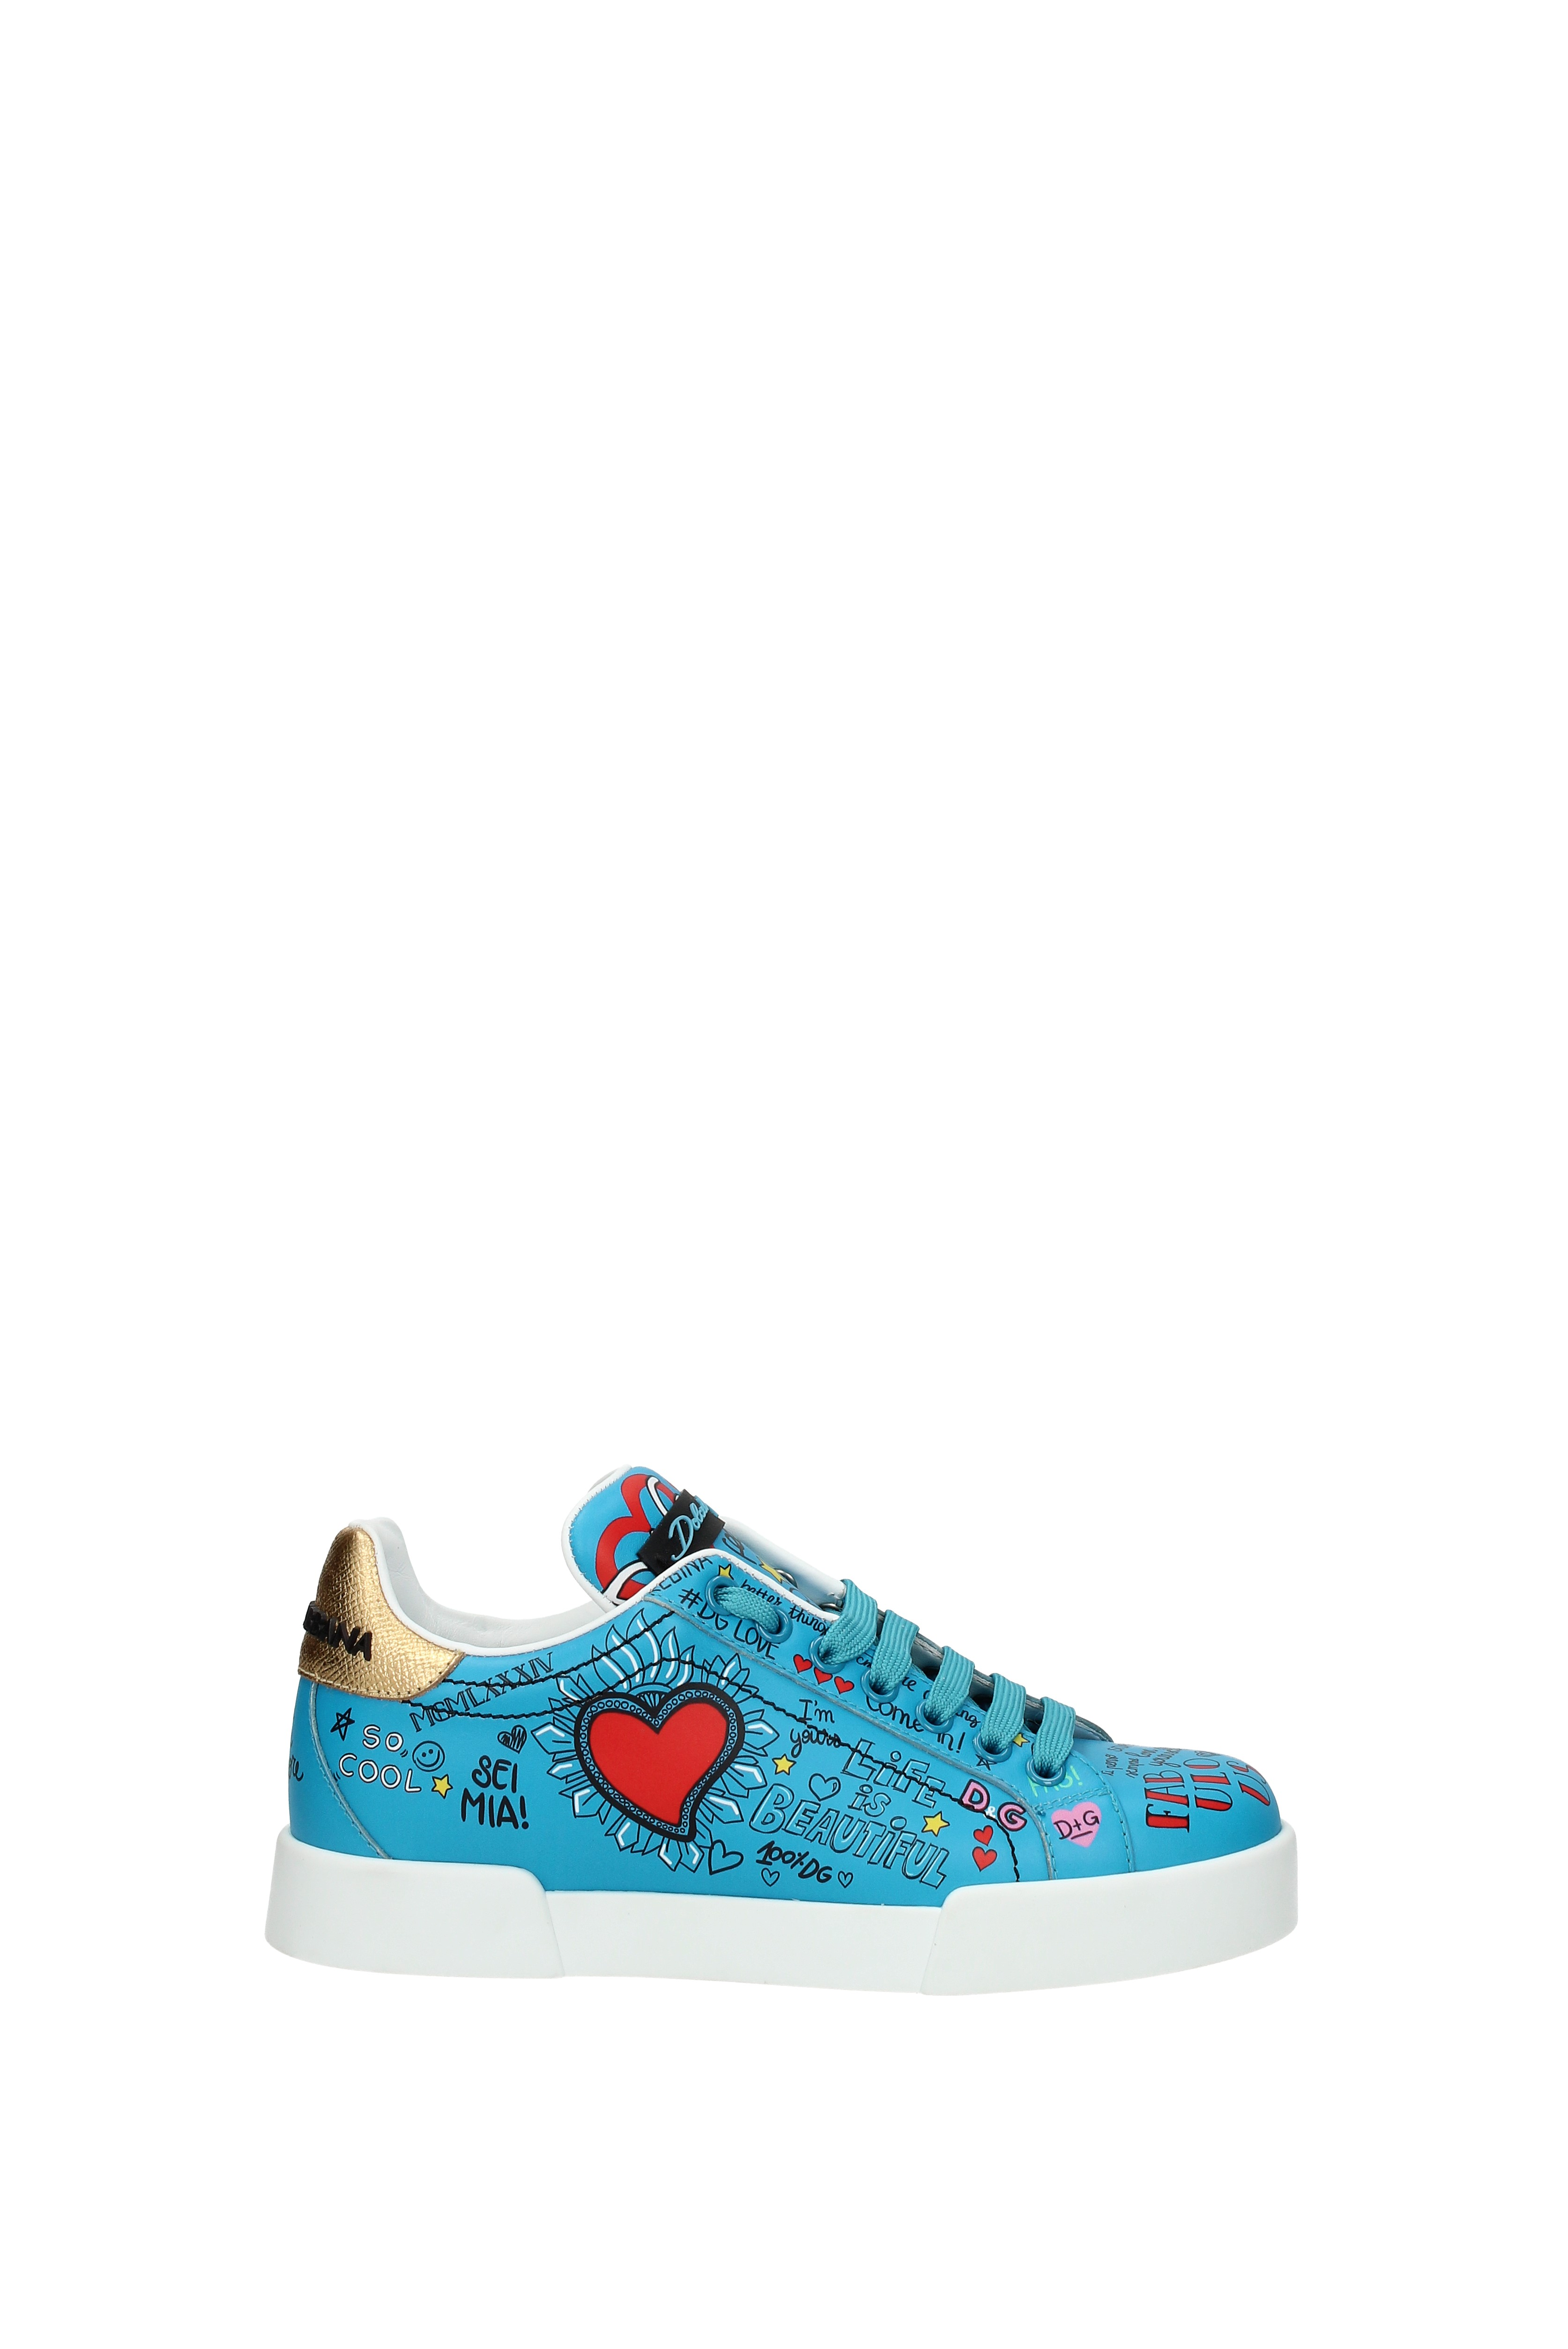 Sneakers portofino Dolce&Gabbana portofino Sneakers Damen - Leder (CK1545AS864) f4b4c2